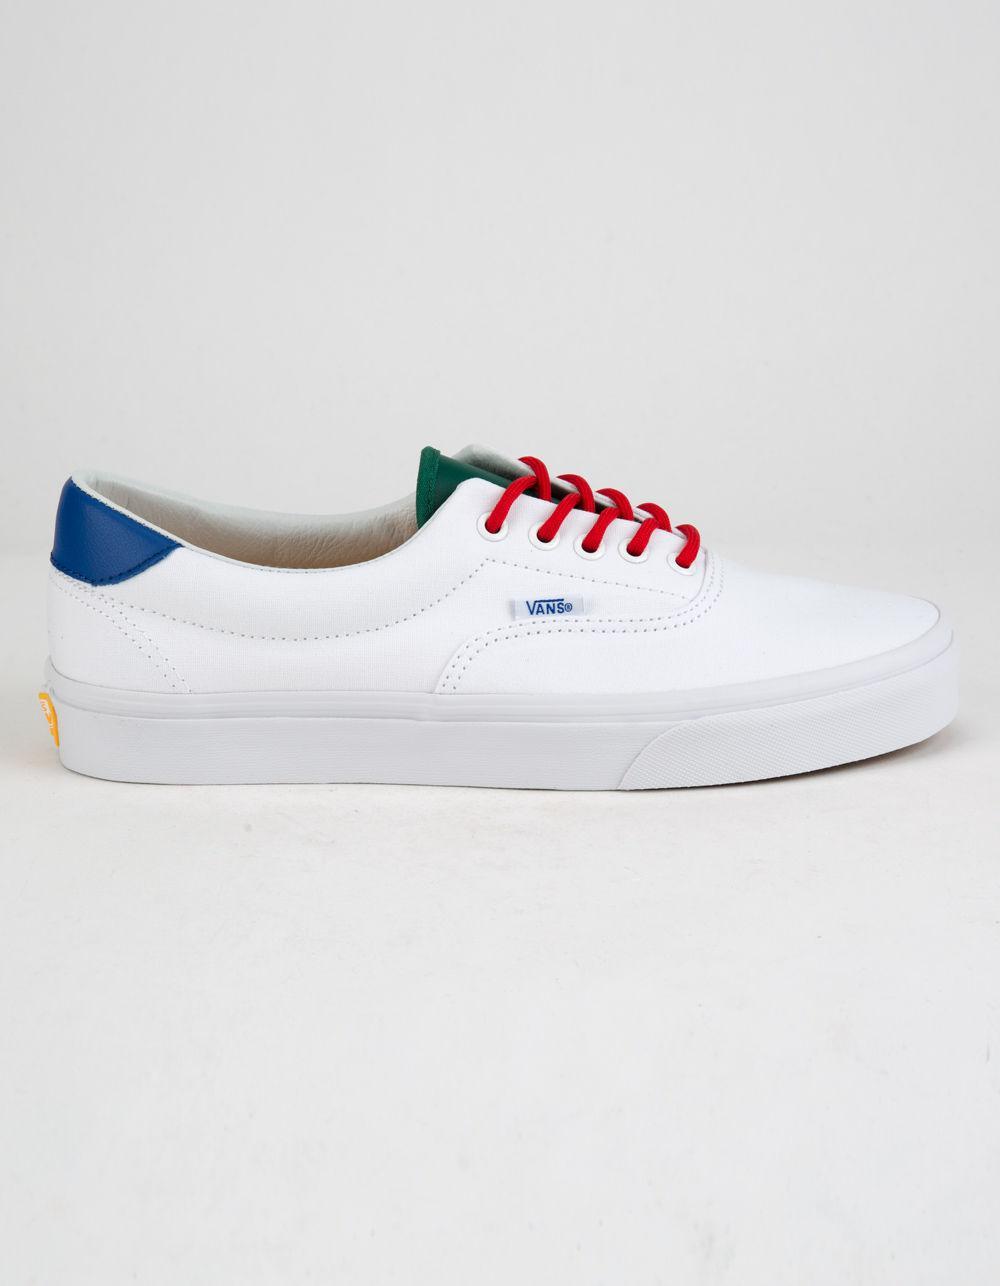 52d78de4866fee Lyst - Vans Yacht Club Era 59 True White Mens Shoes in White for Men